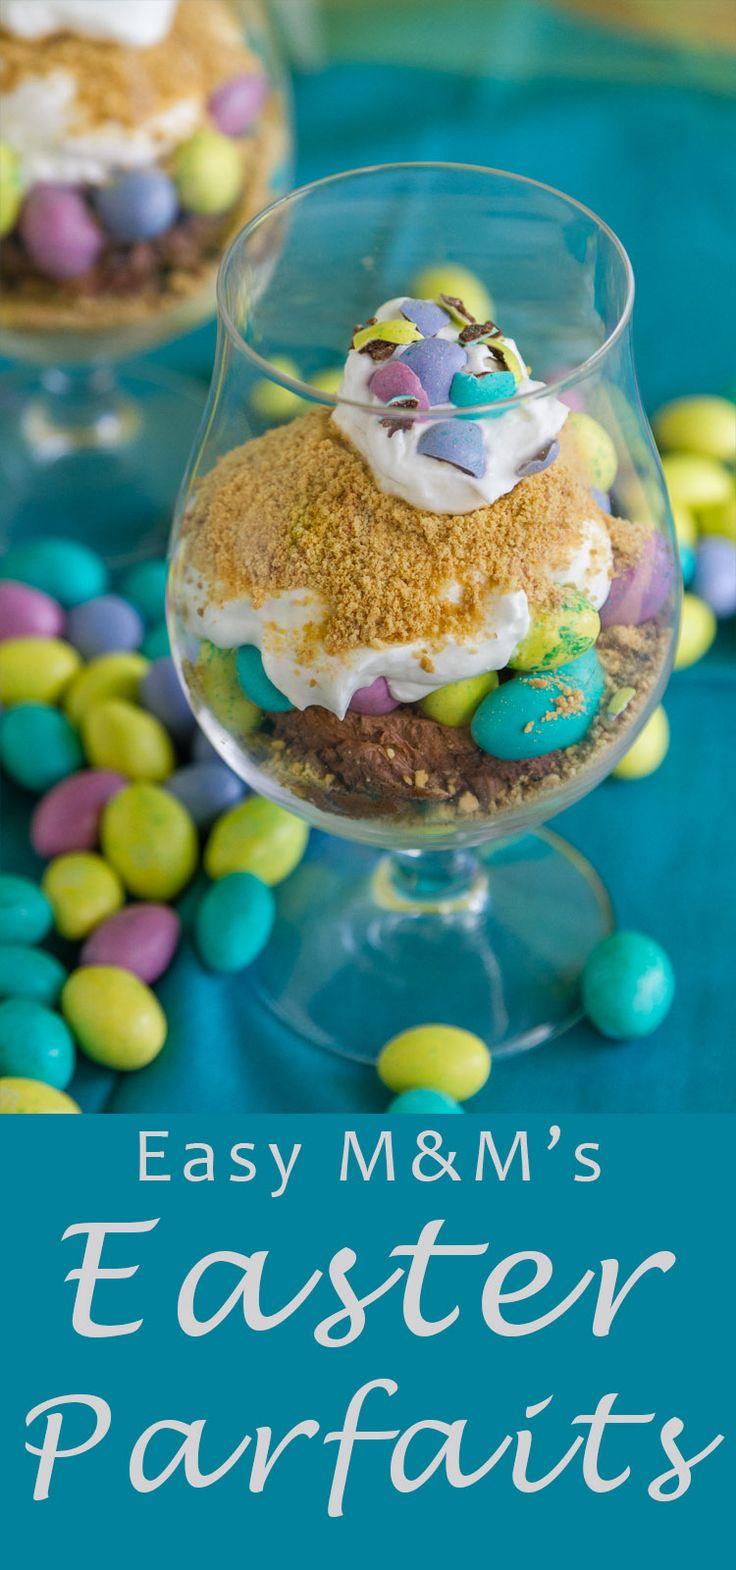 Easy M&Ms® Easter Individual Parfaits - fun & delicious! #sponsored #ad @mmschocolate, @DoveChocolateUS